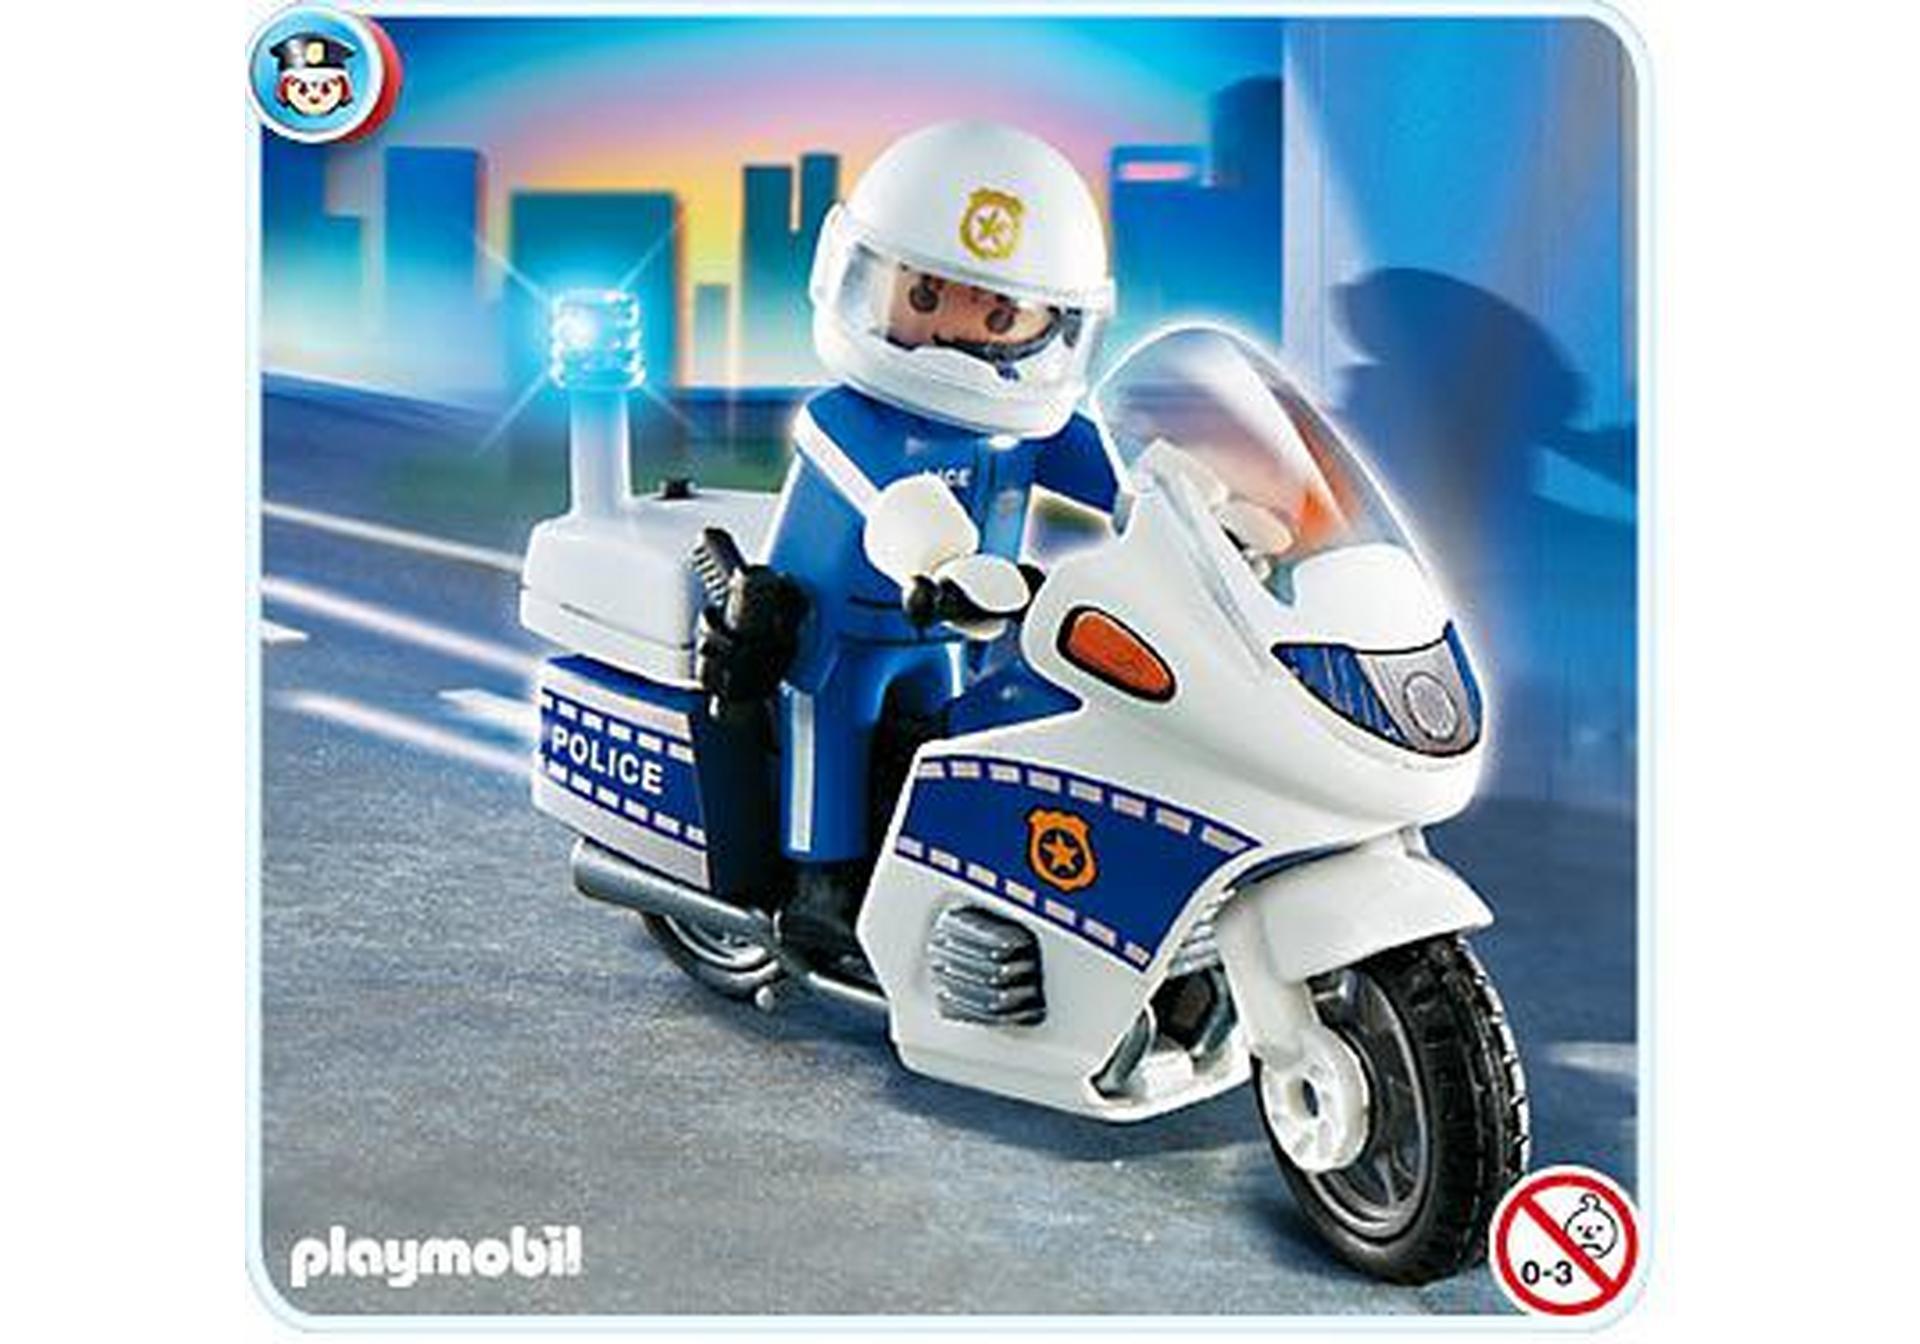 Motard de police 4262 a playmobil france - Jeux de motos de police ...